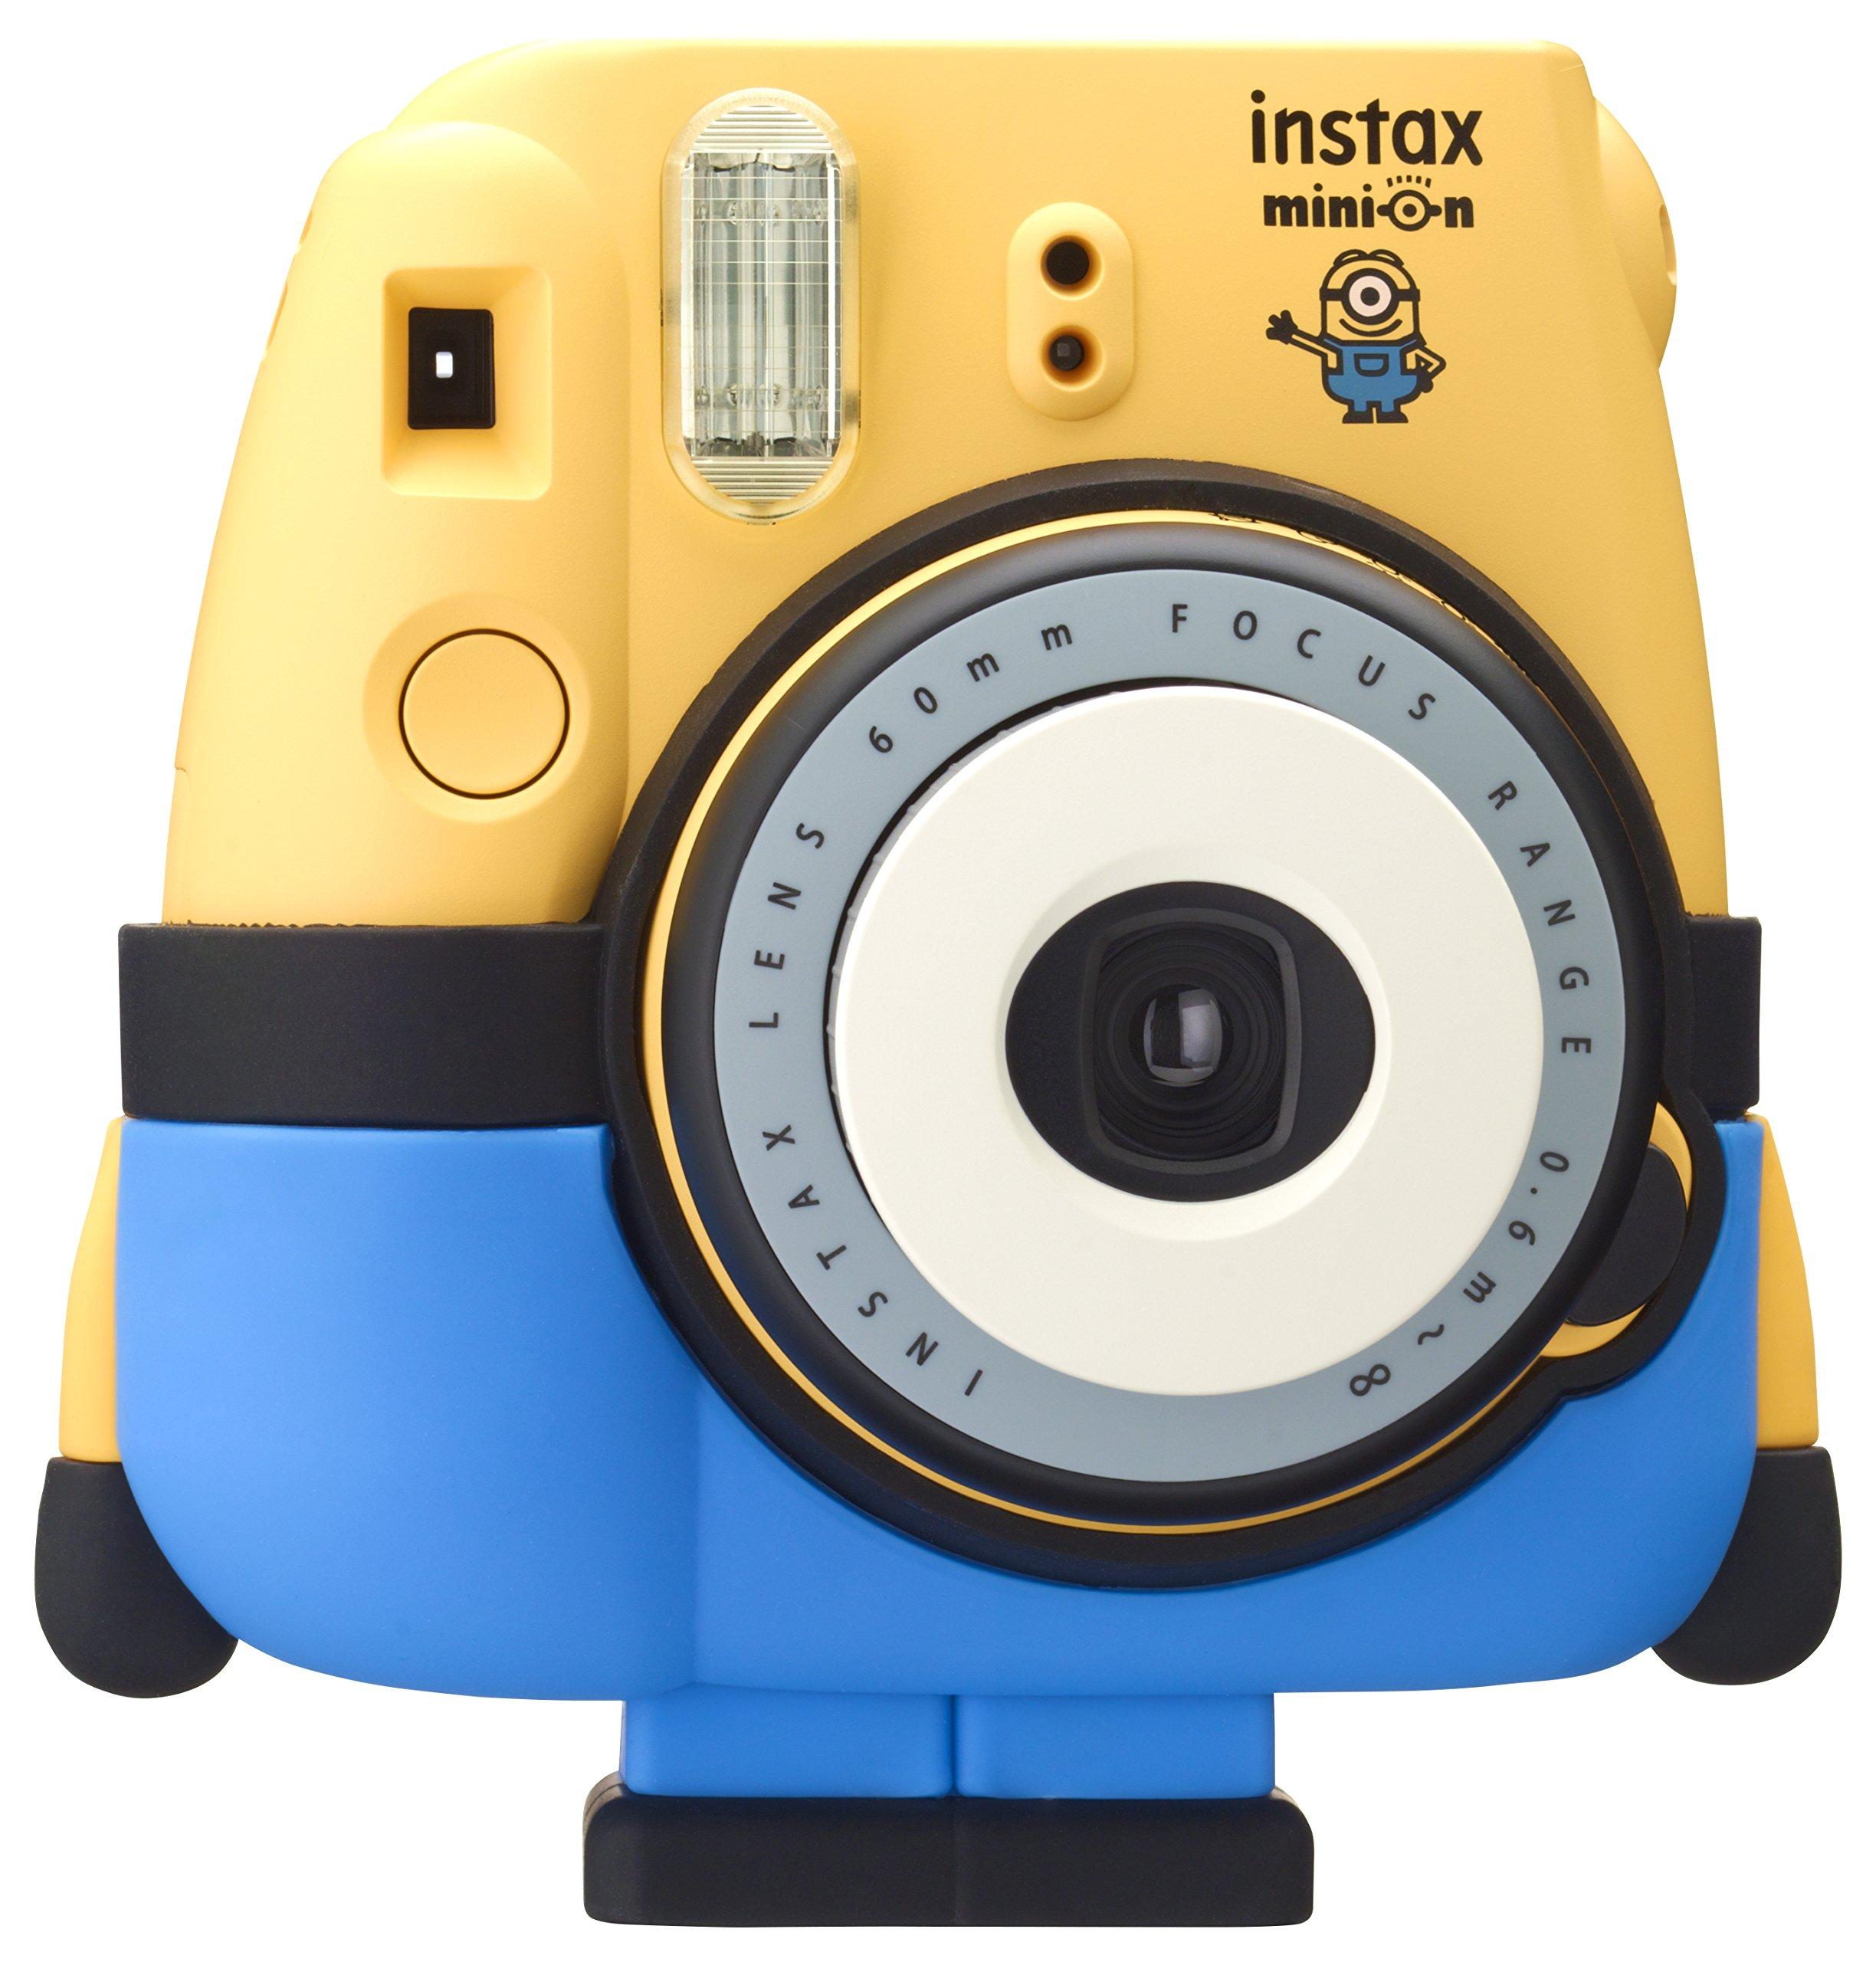 Fujifilm Instax Minion Instant Film Camera by Fujifilm